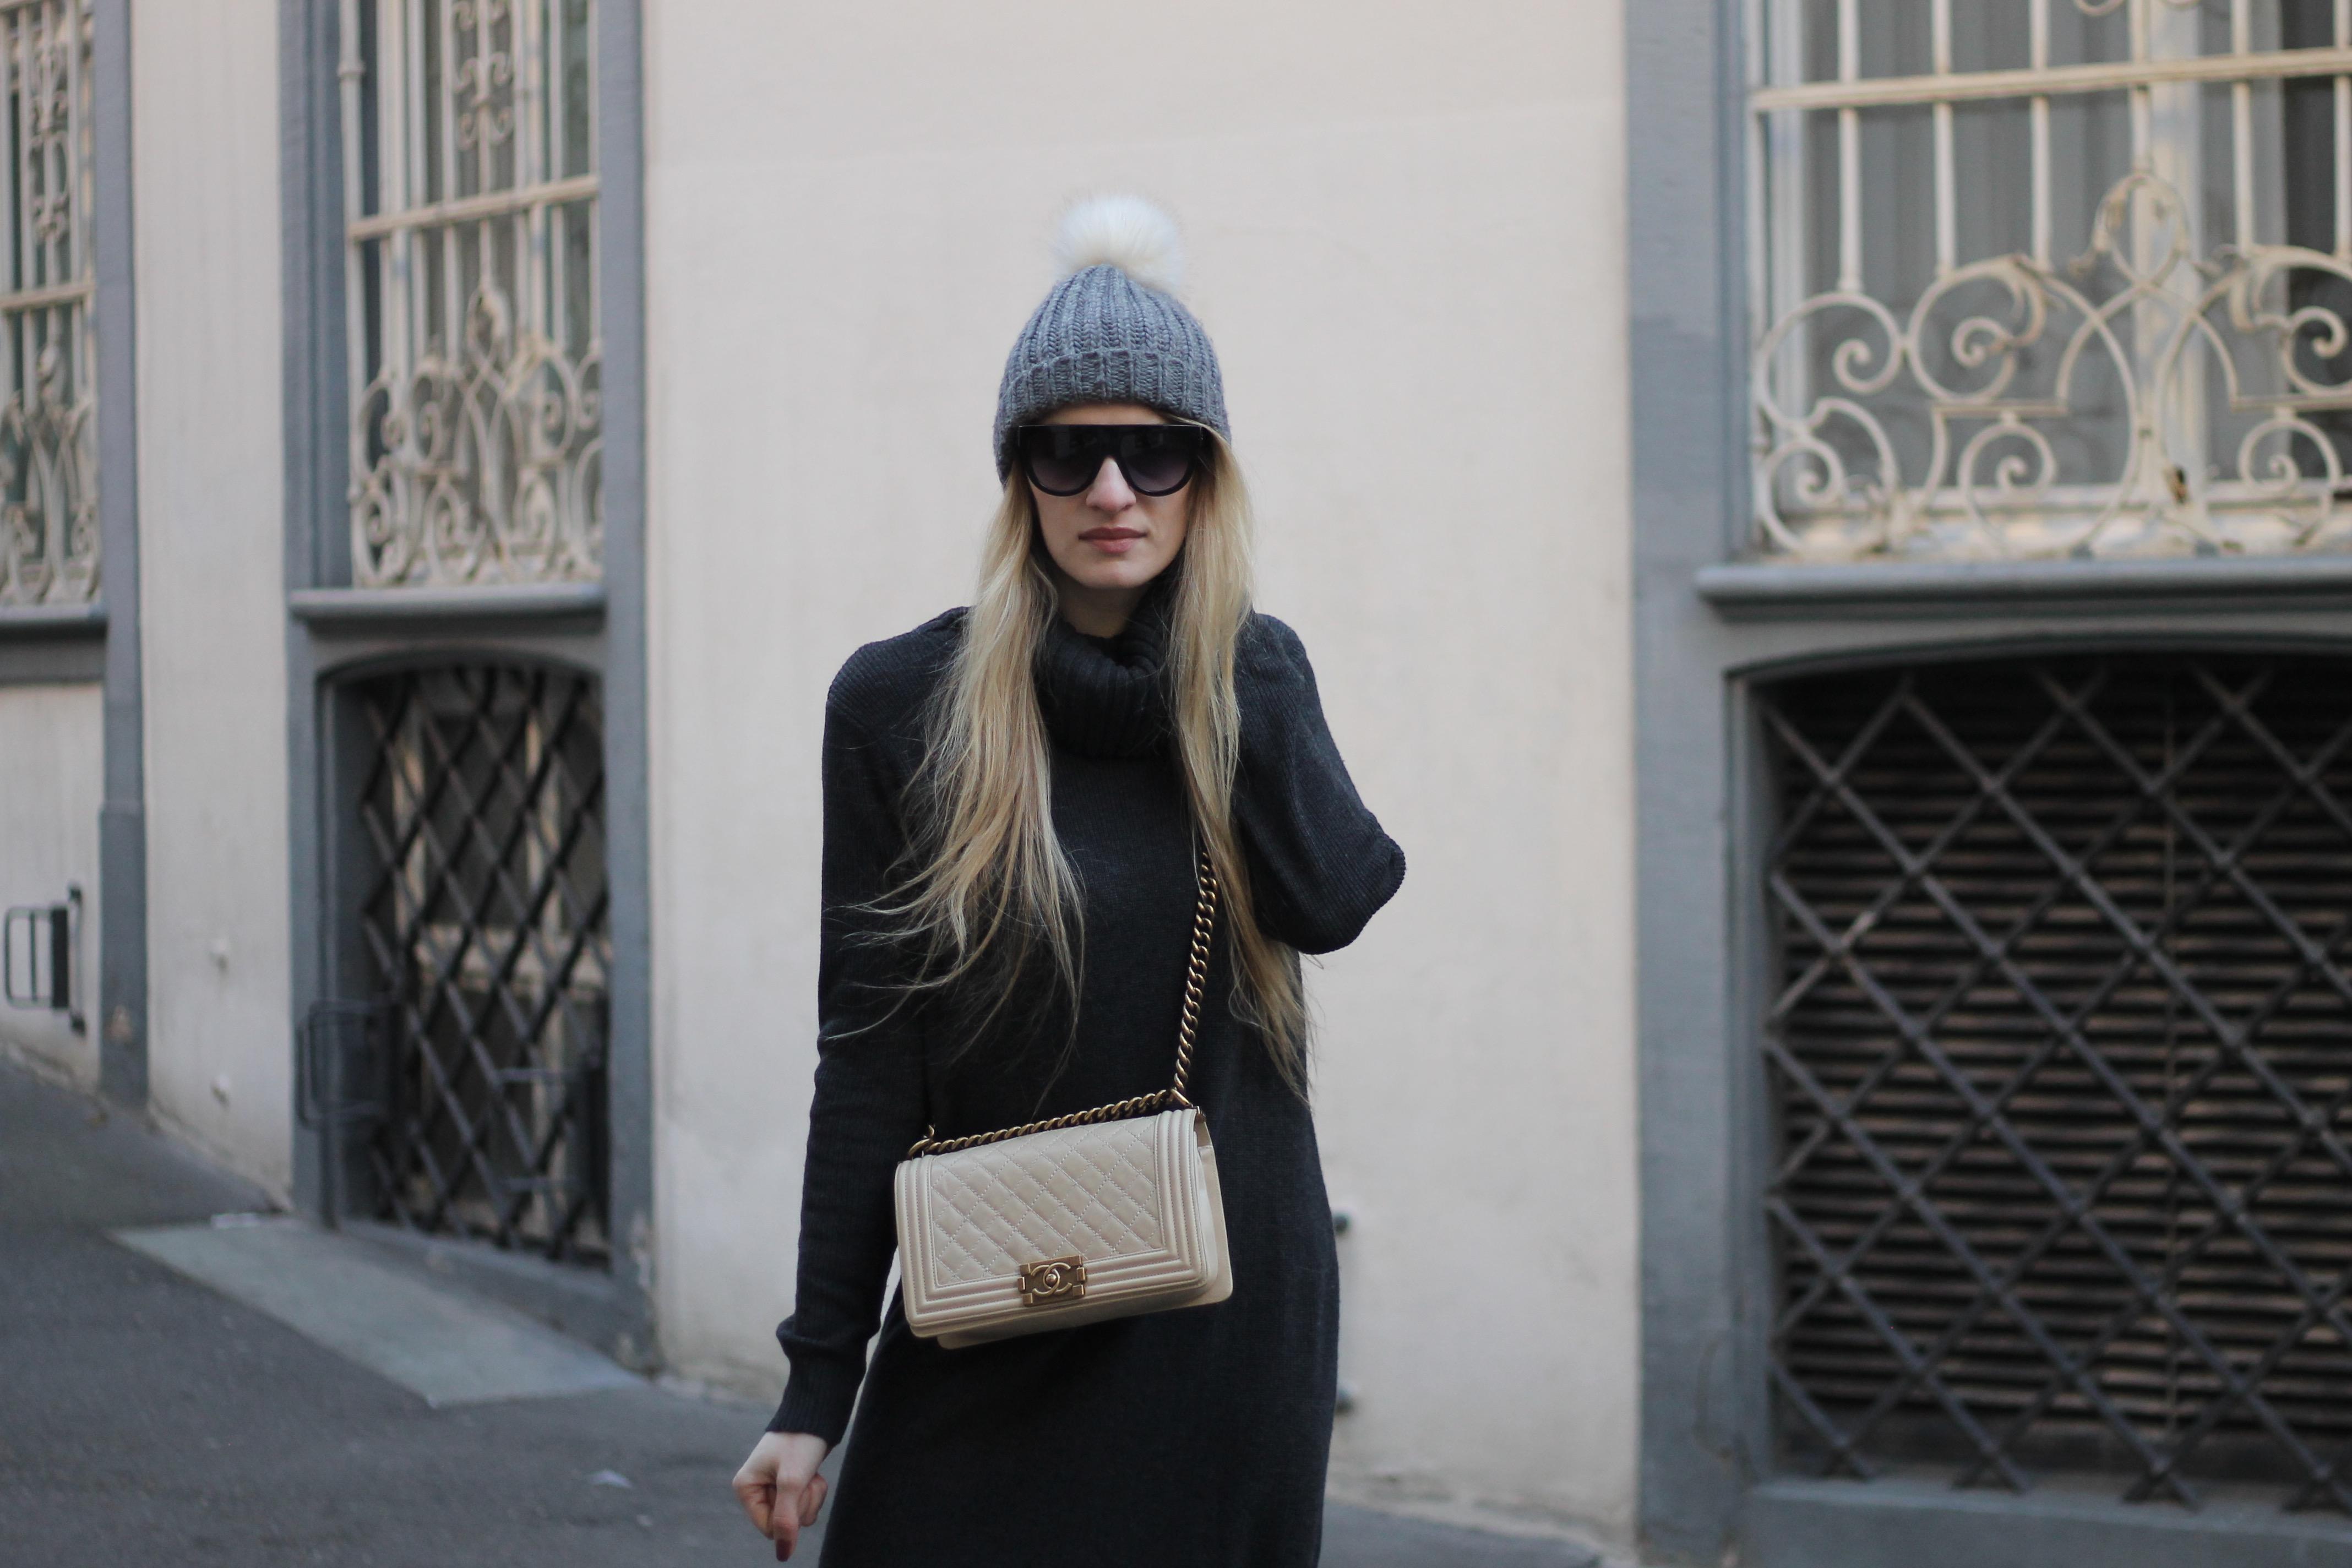 MON MODE   Fashion Blogger   Berlin Street Style   MonMode Blog   Fur Mules   Oversized Sweater Dress  Basel   Switzerland